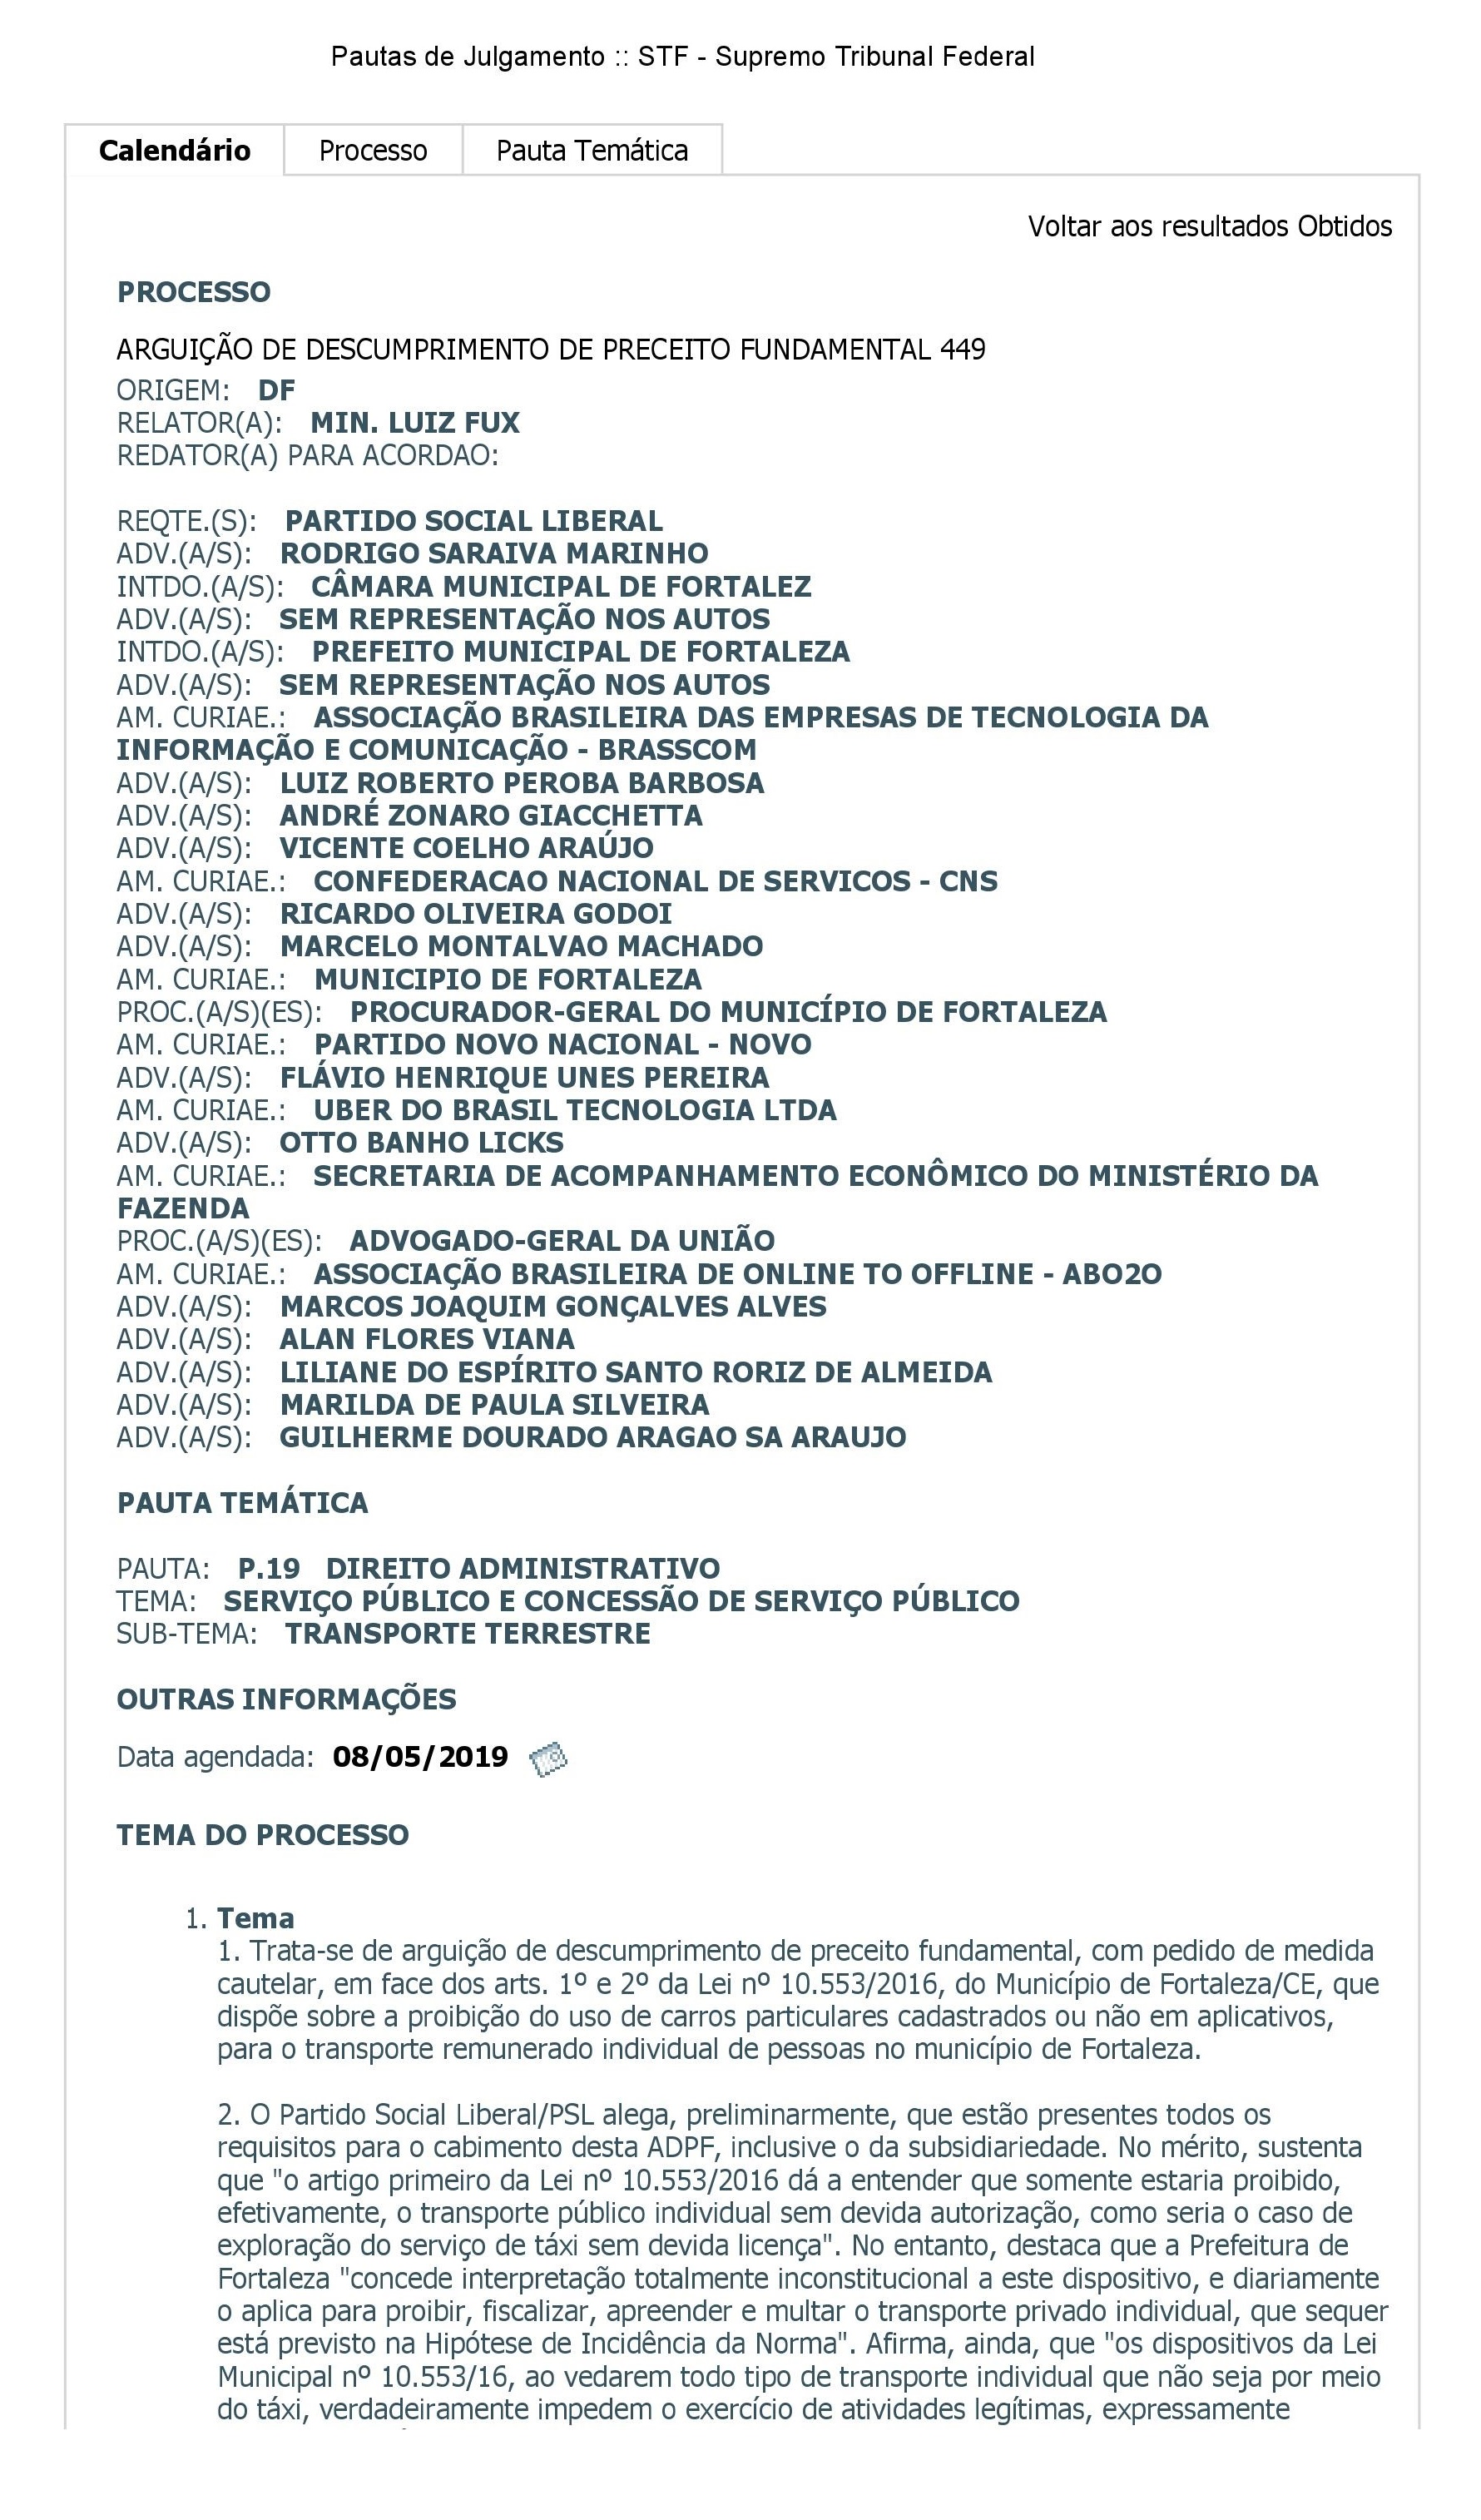 pauta_julgamento_STF_a_01